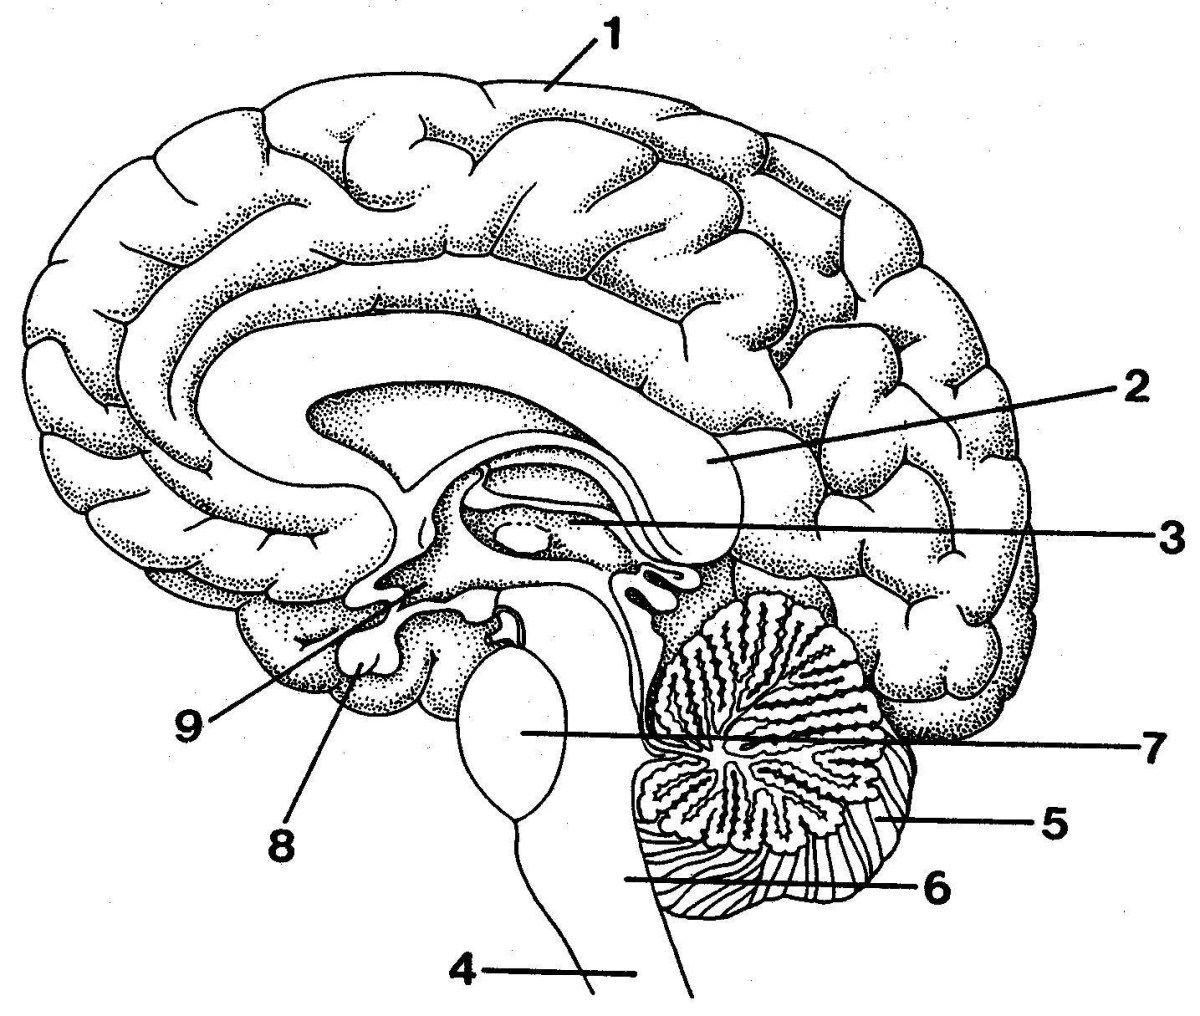 Blank Brain Diagram Blank Outline Of The Human Brain